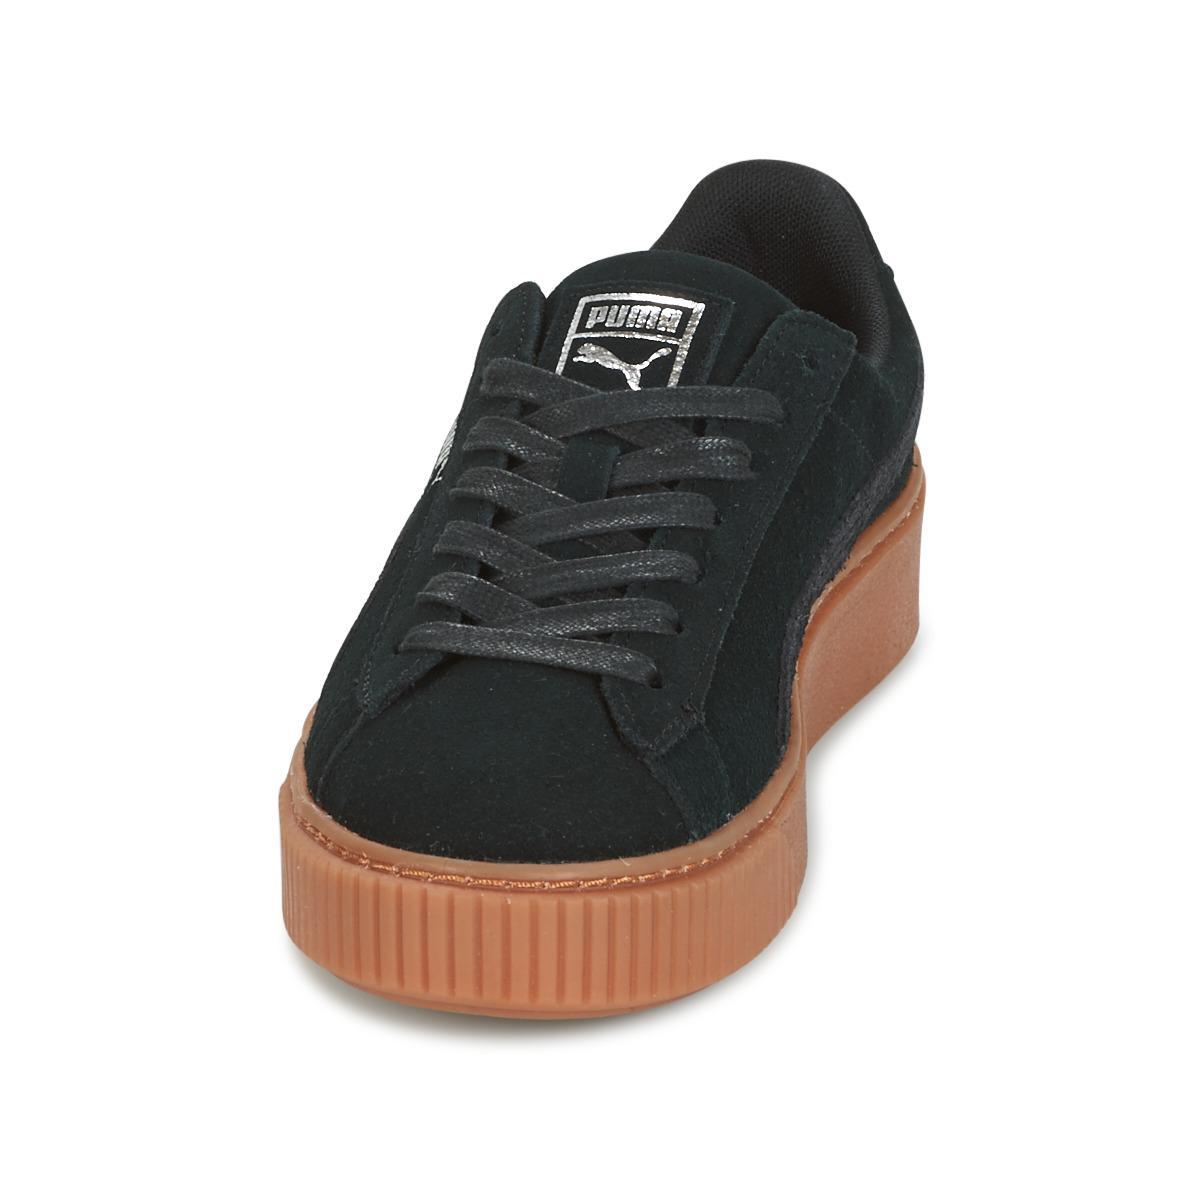 974fe1d95452 PUMA Suede Platform Core Gum Women s Shoes (trainers) In Black in ...